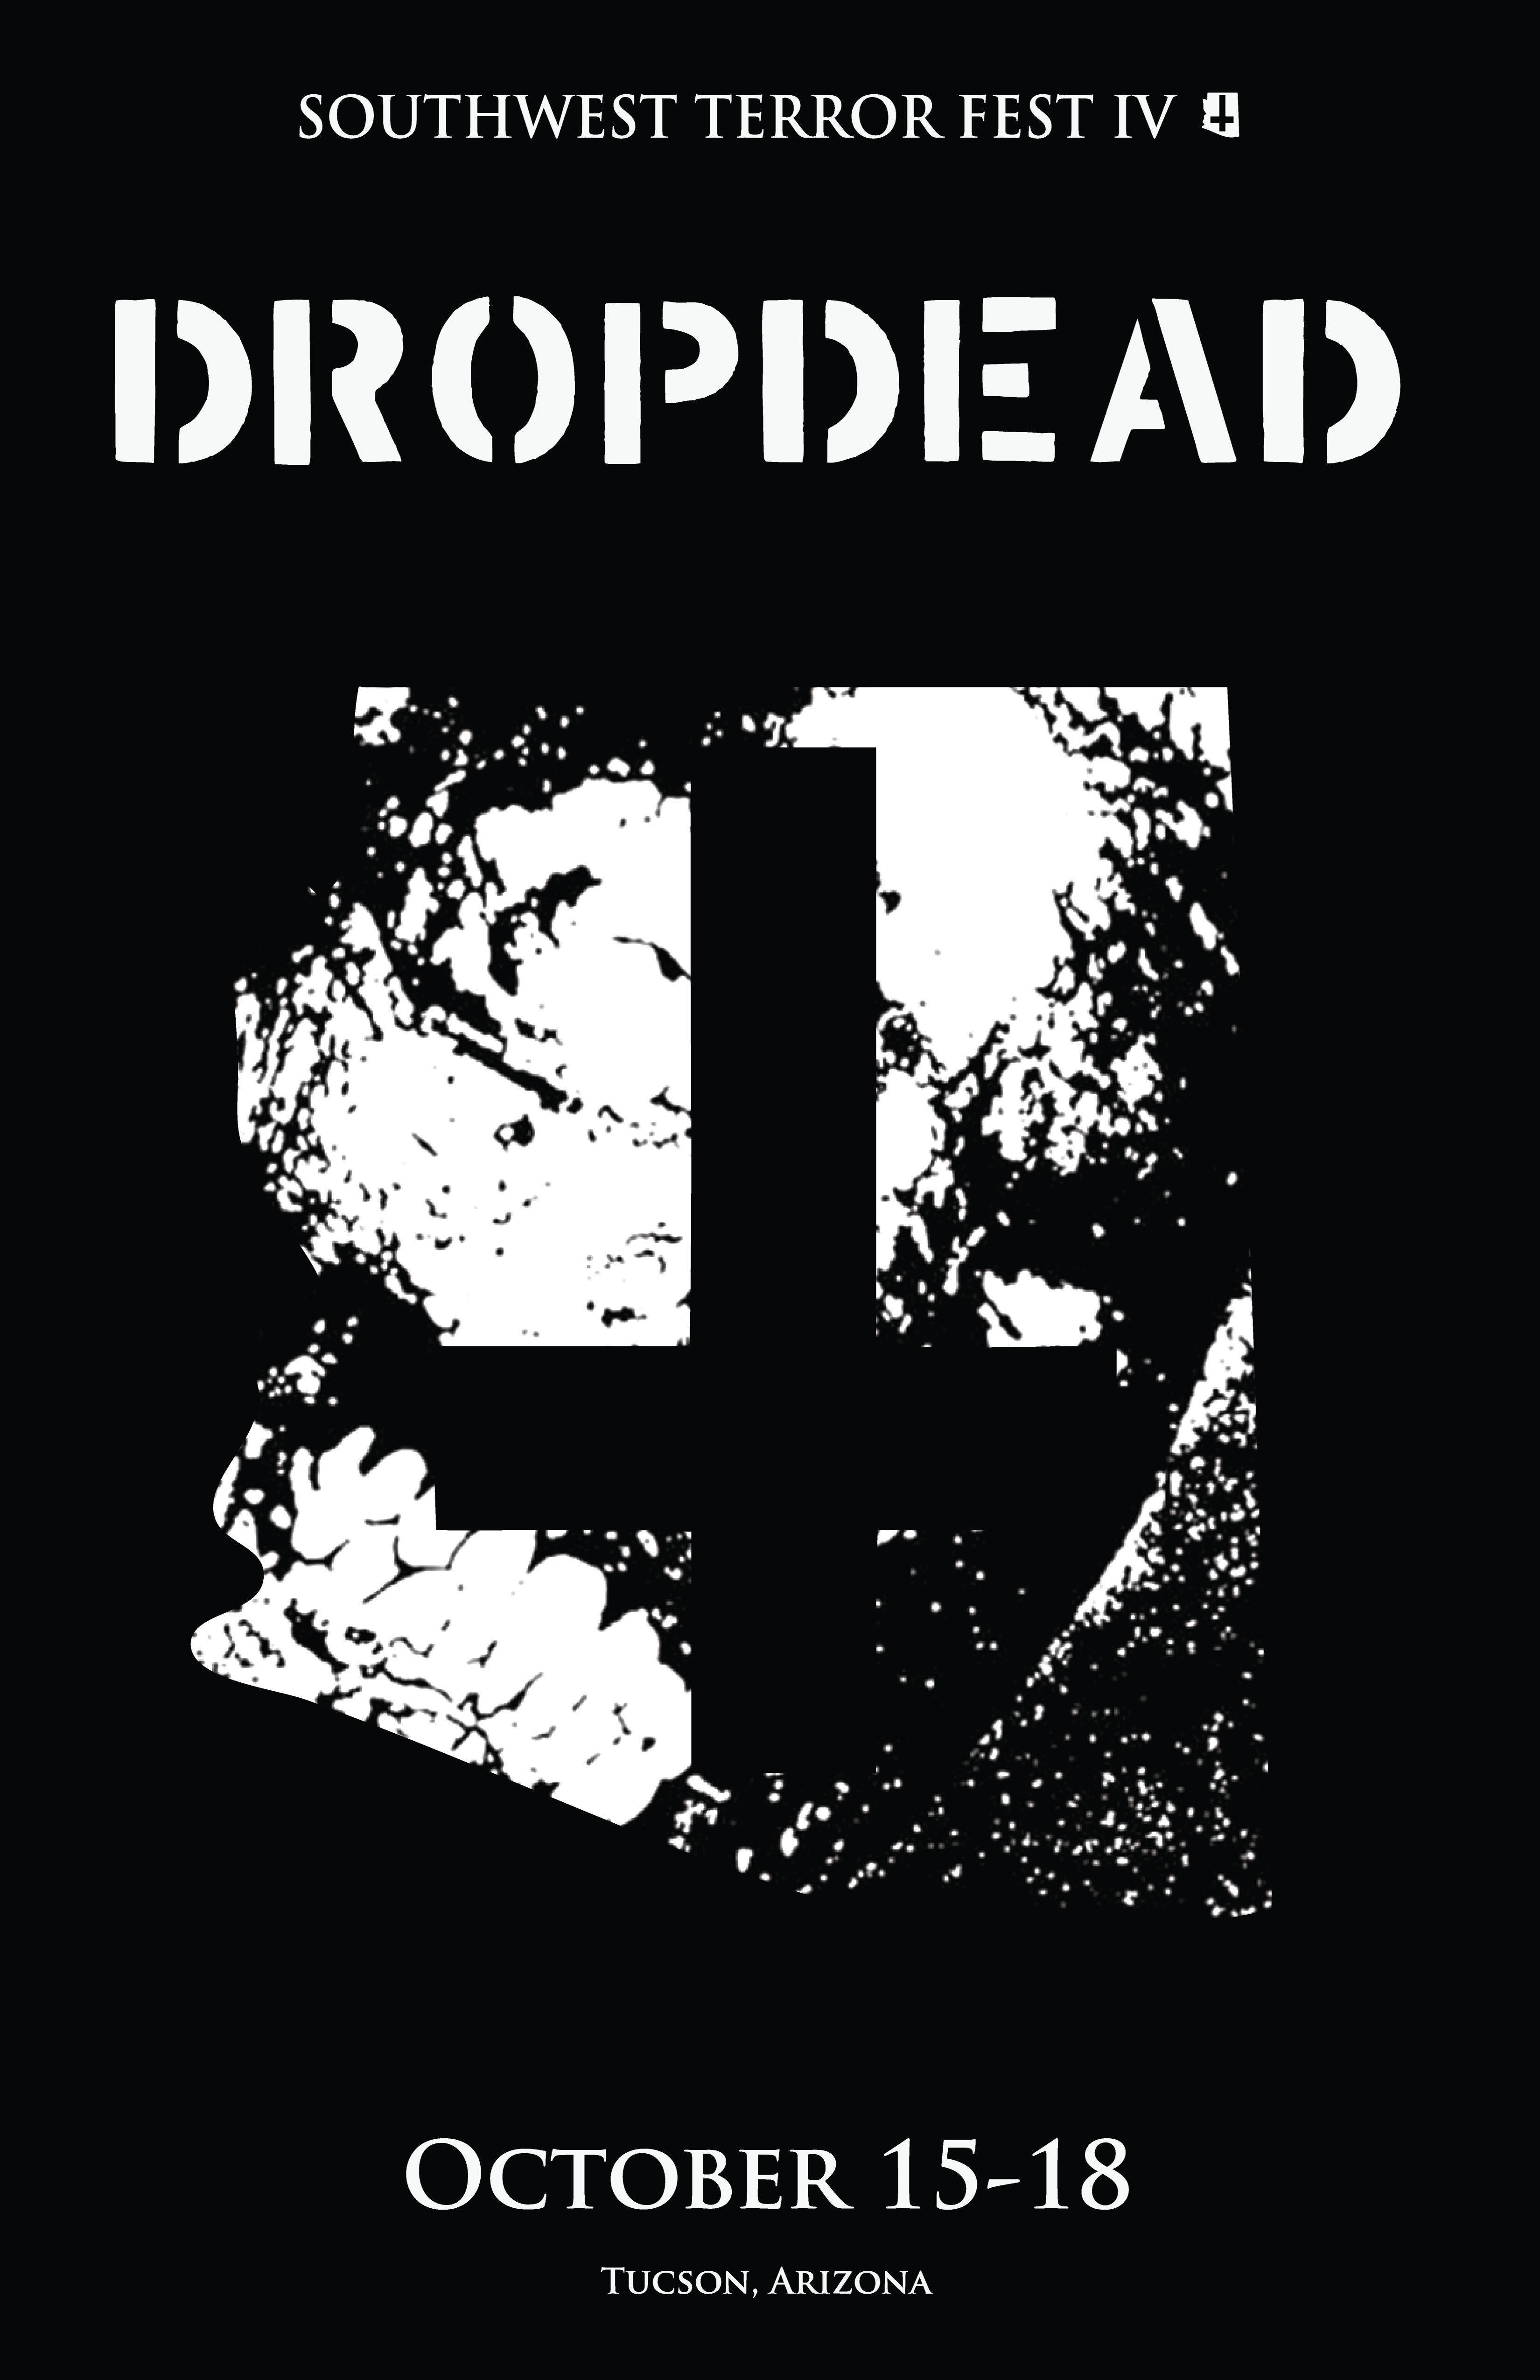 Southwest Terror Fest 2015 Bulletin: DROPDEAD to Destroy ... Drop Dead Clothing History